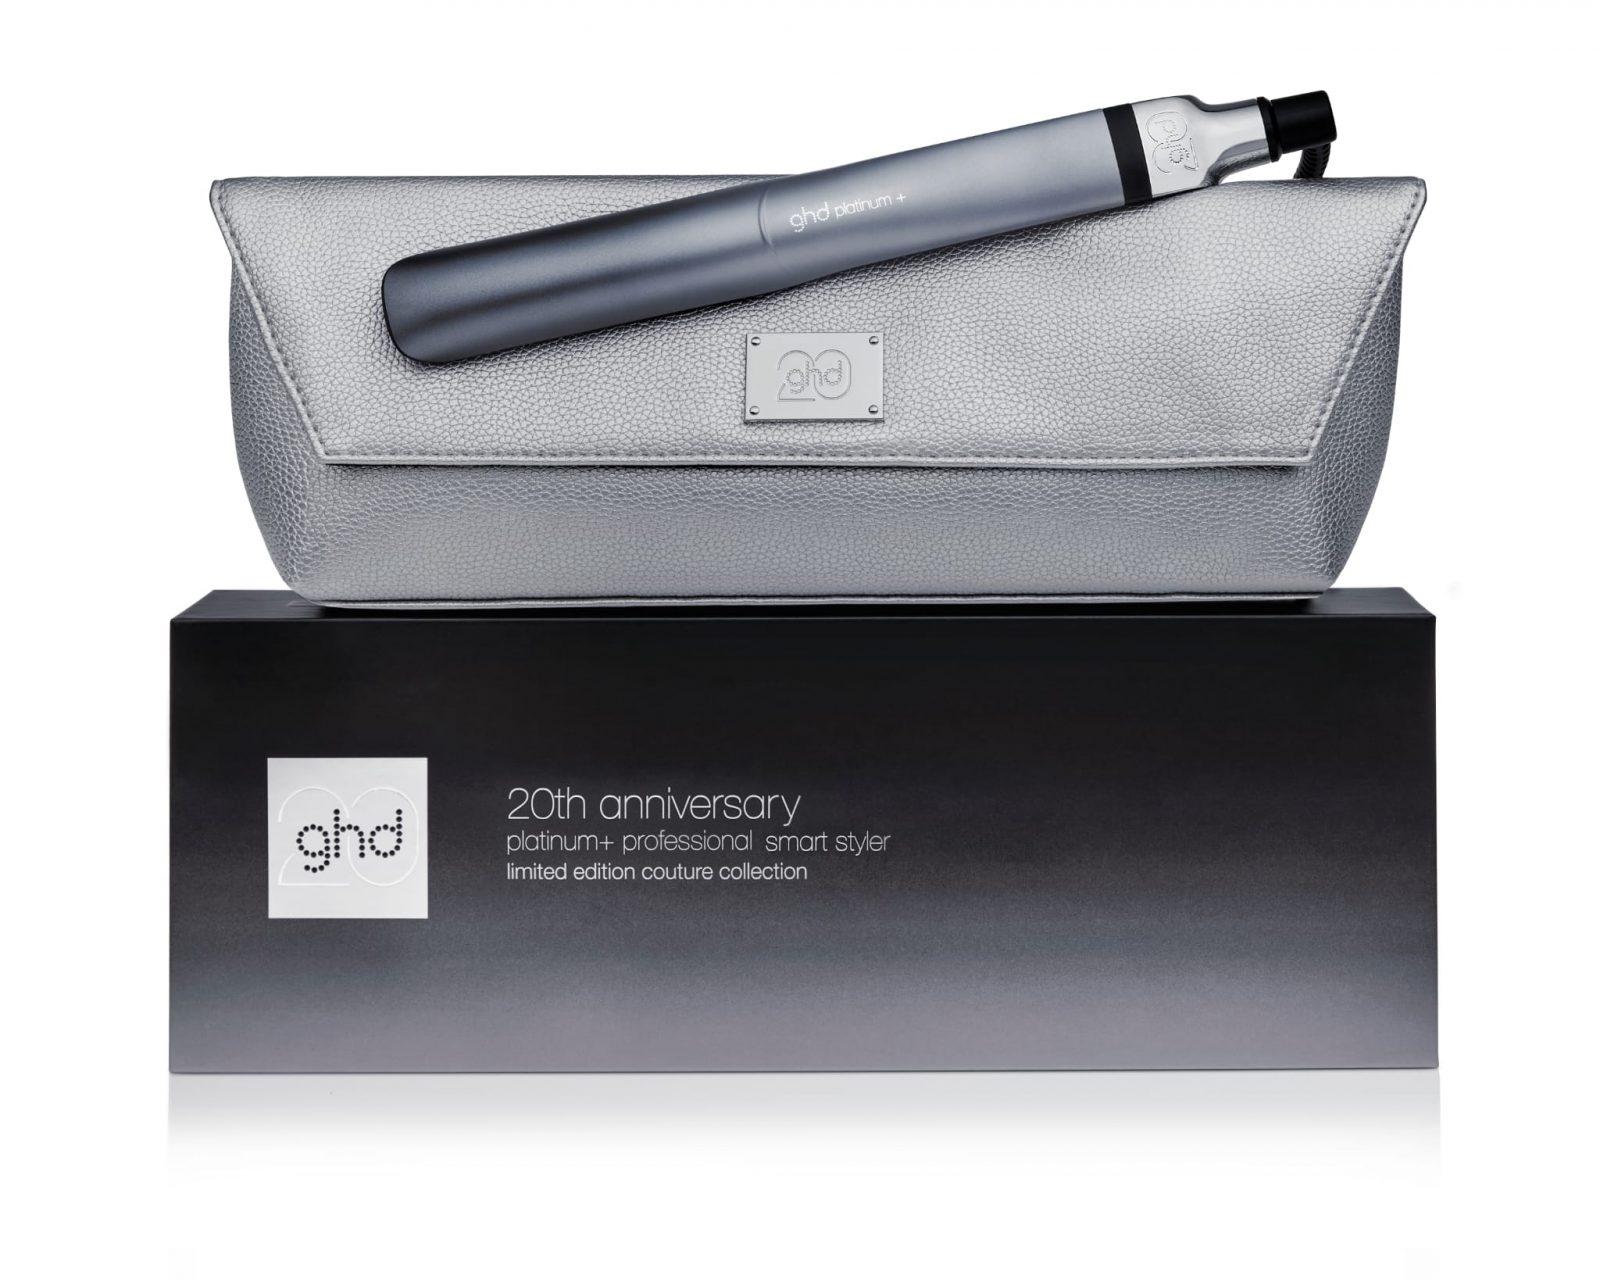 Plancha de pelo GHD Platinum+ couture collection